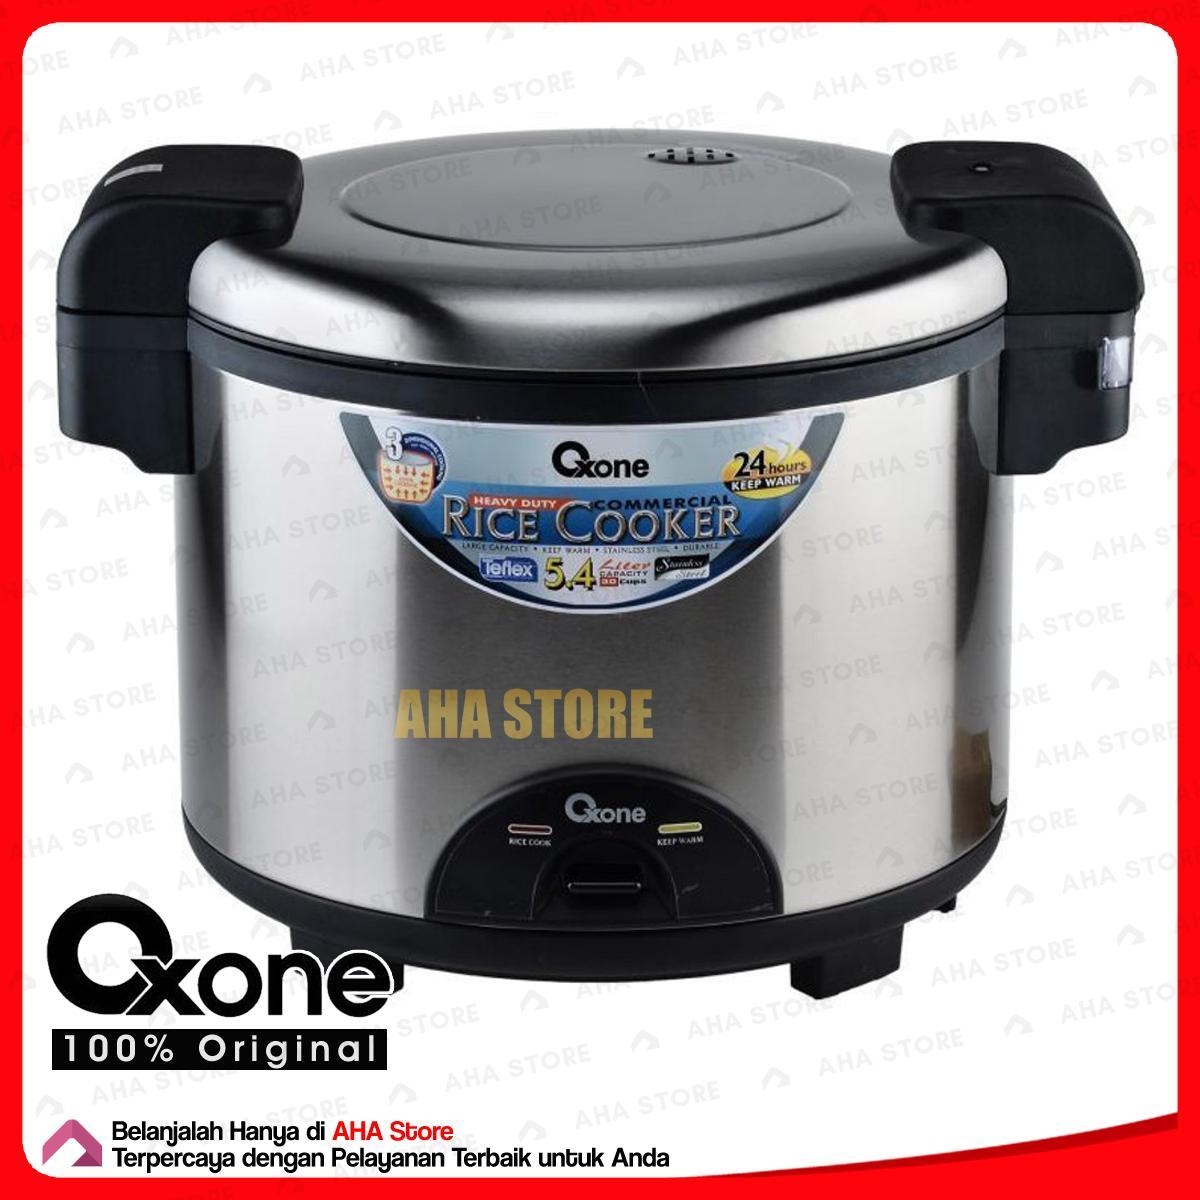 Oxone Ox 189 Jumbo Rice Cooker5 Daftar Harga Terkini Terlengkap Sharp Cooker Ksr18mspk Penanak Nasi 54 Liter